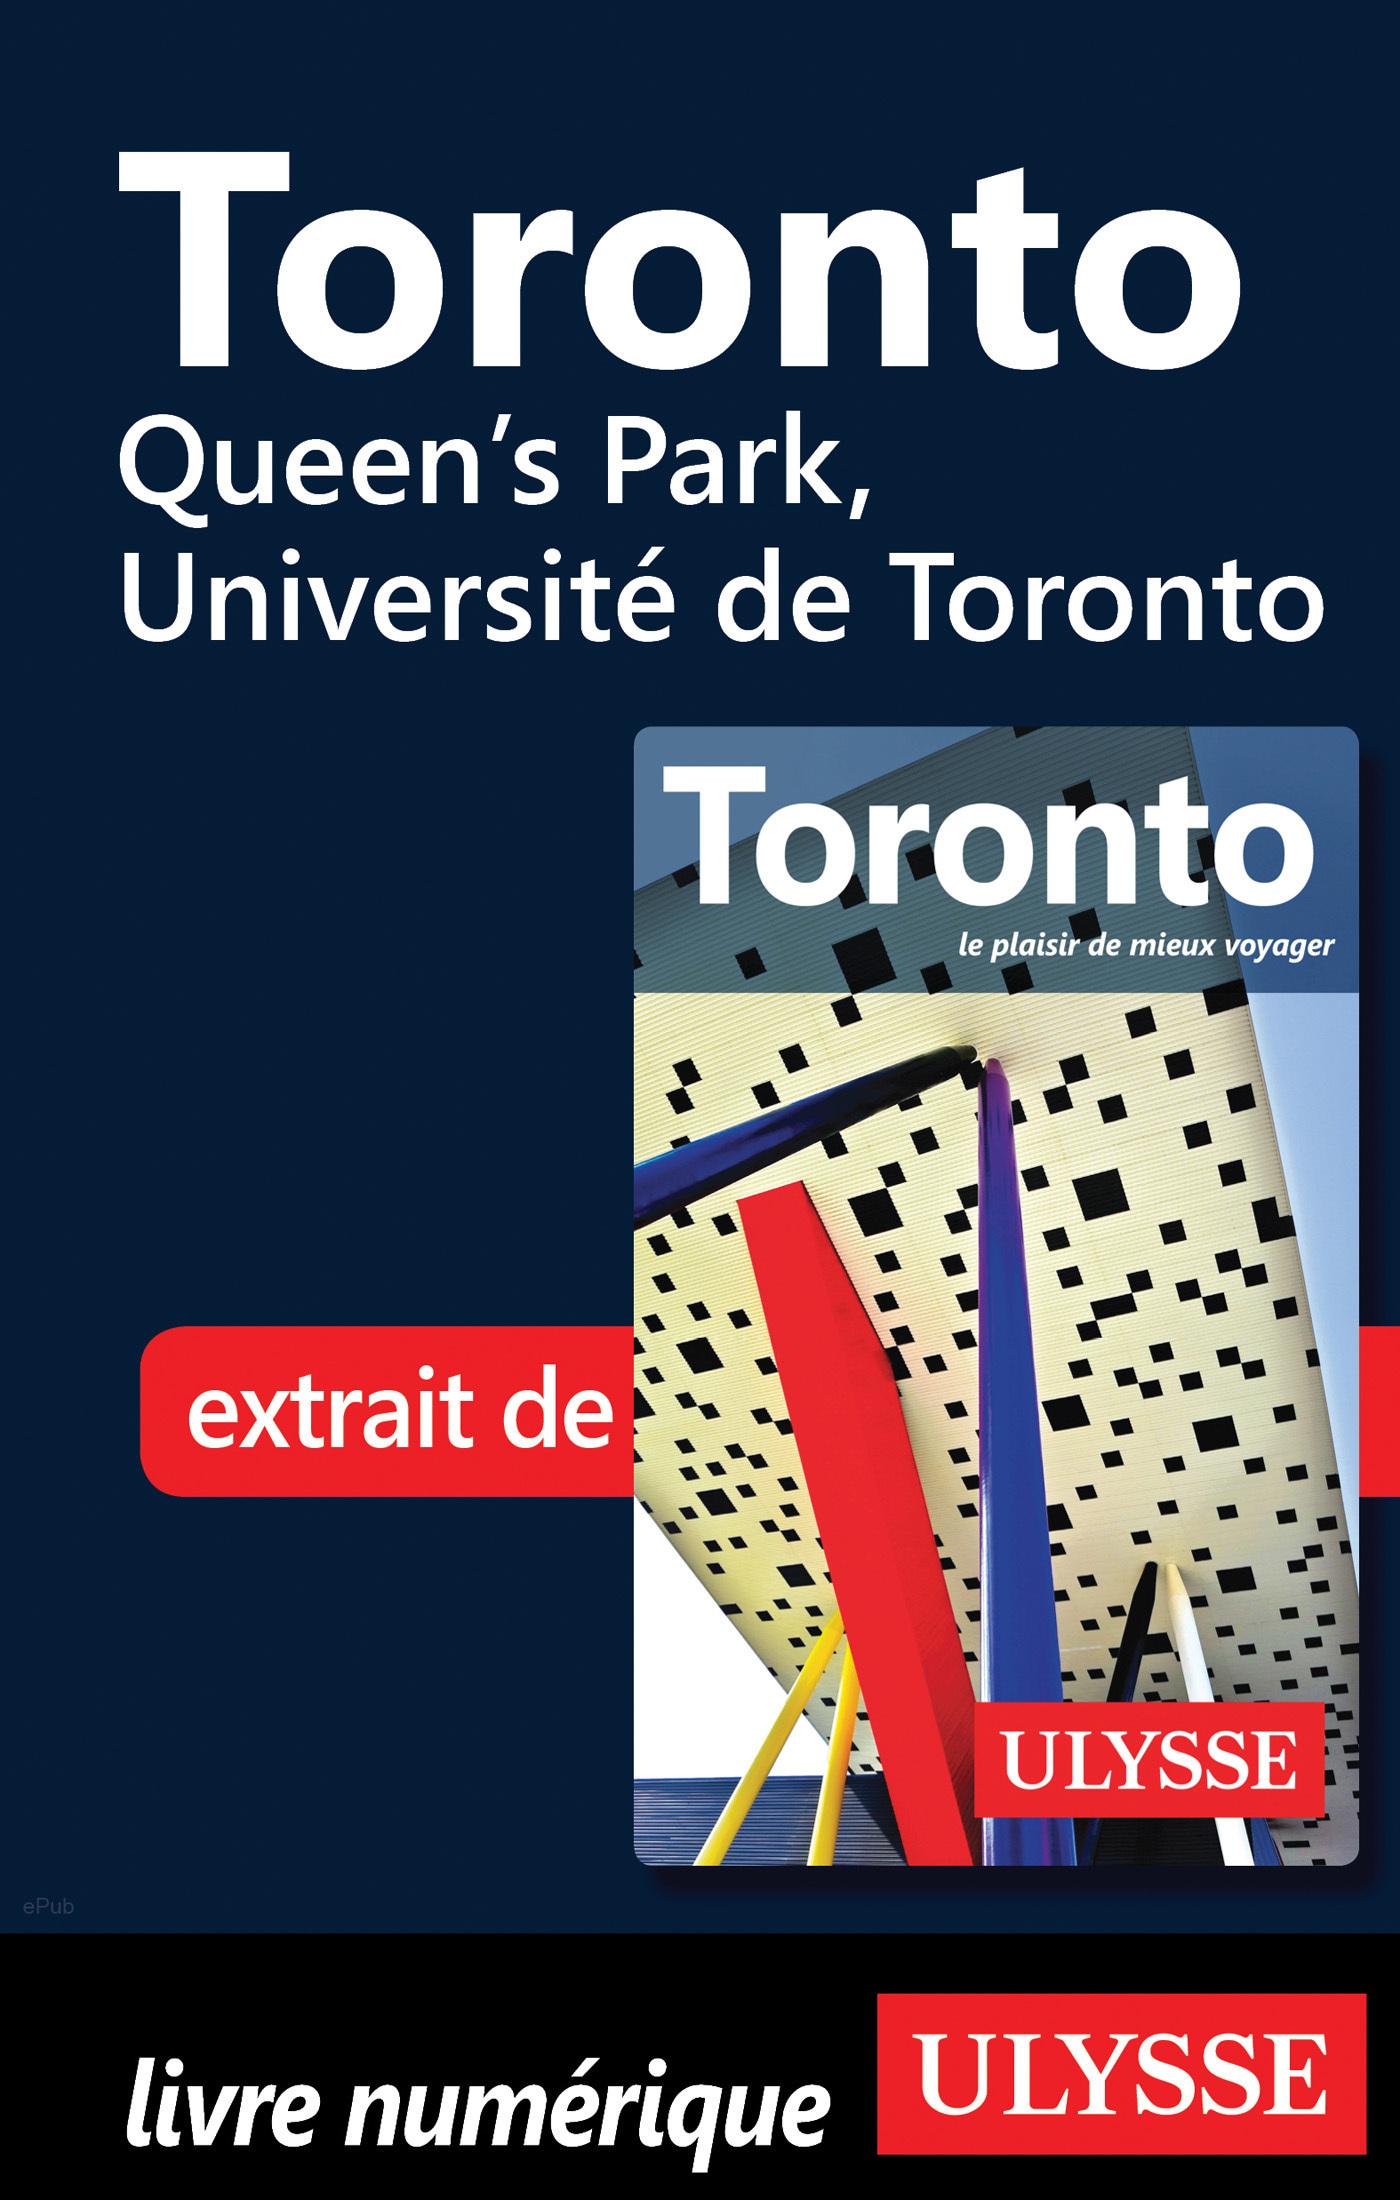 Toronto - Queen's Park, Université de Toronto